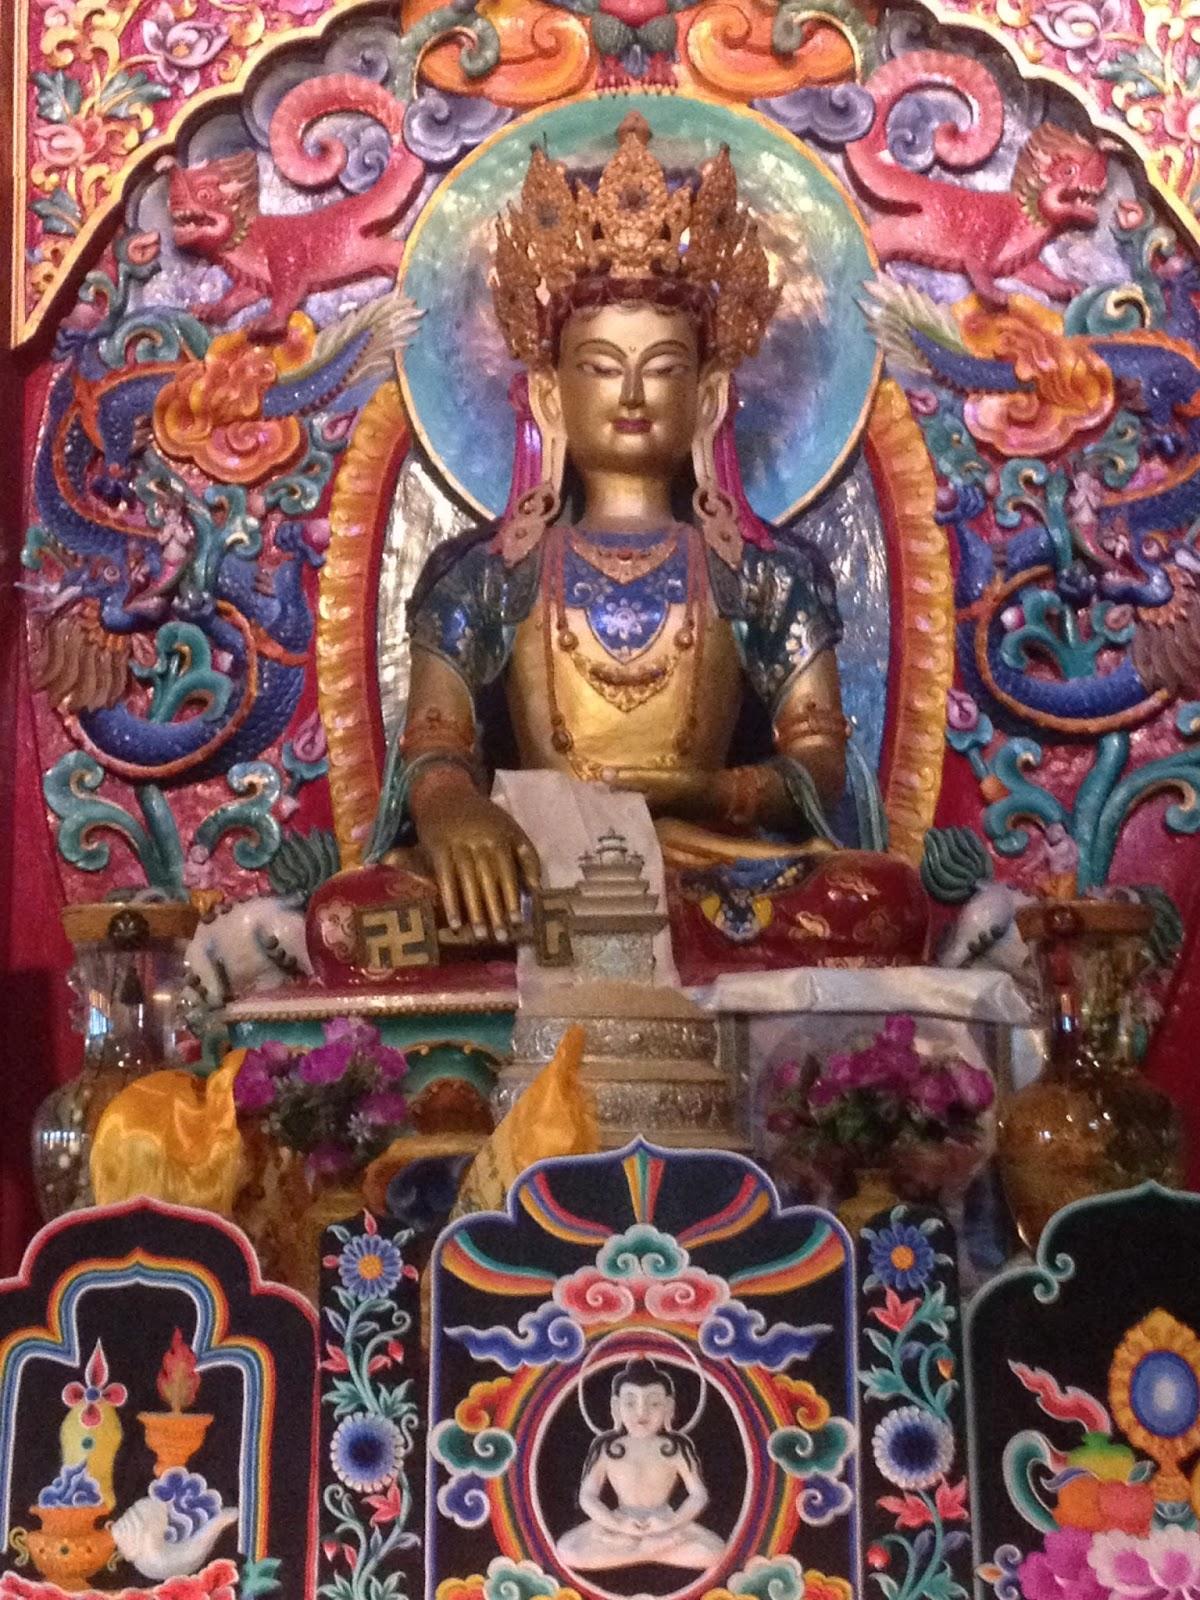 The Religion Of Two Face Batman Villain Harvey Dent: བདེན་པའི་སྐྱ་རེངས། Denpai Kyareng: Bon Religion Of Tibet